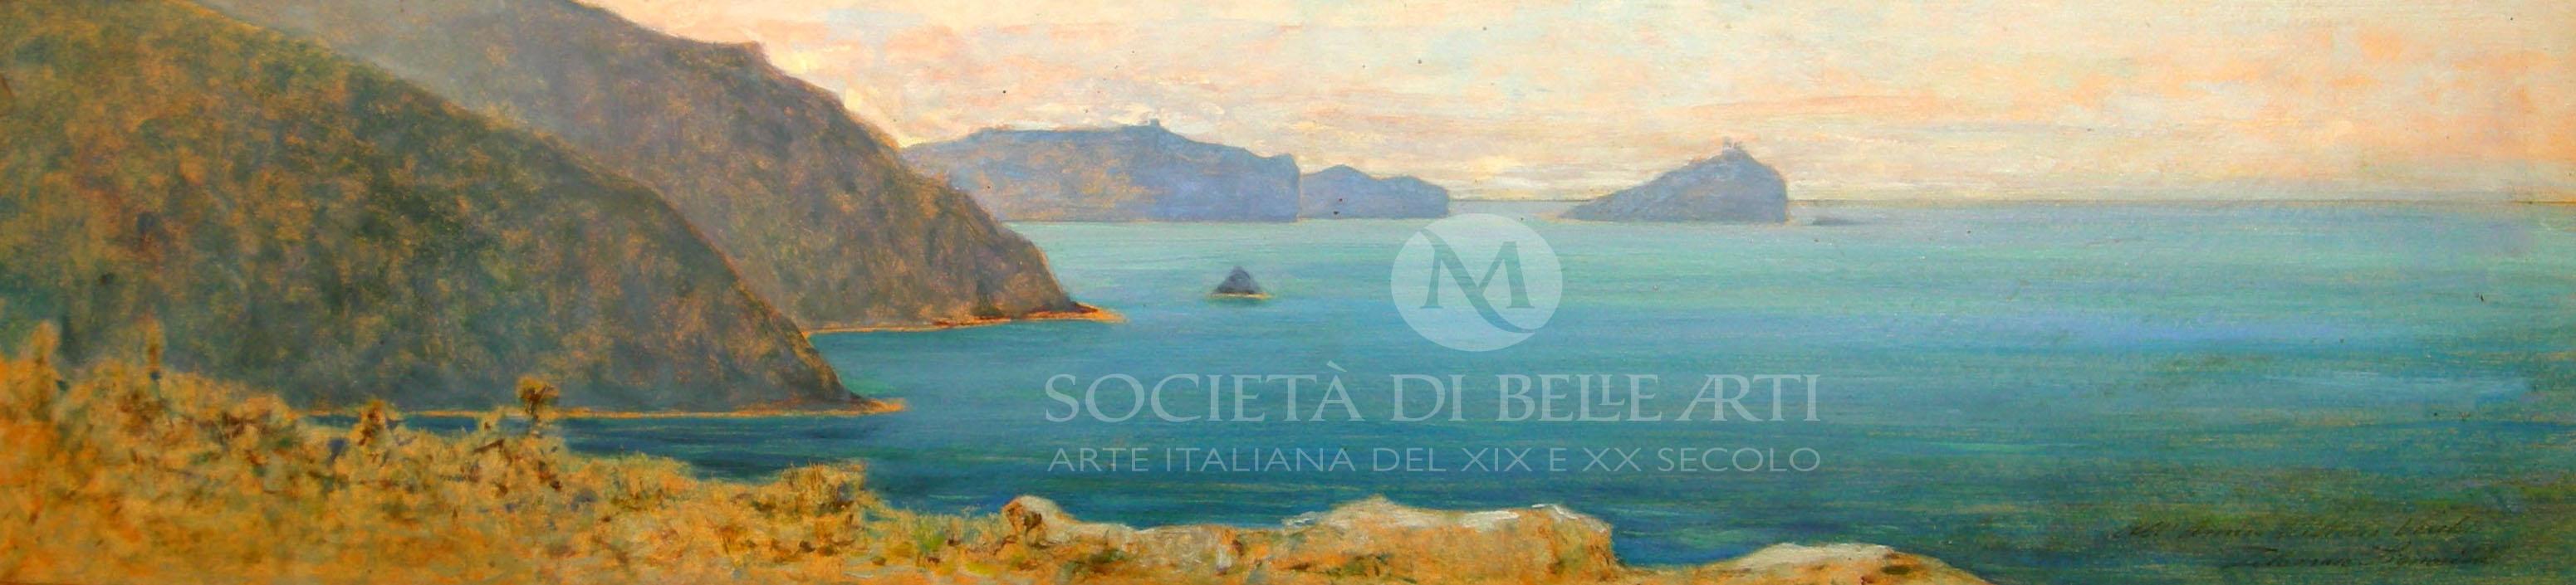 Compra quadri di Telemaco Signorini